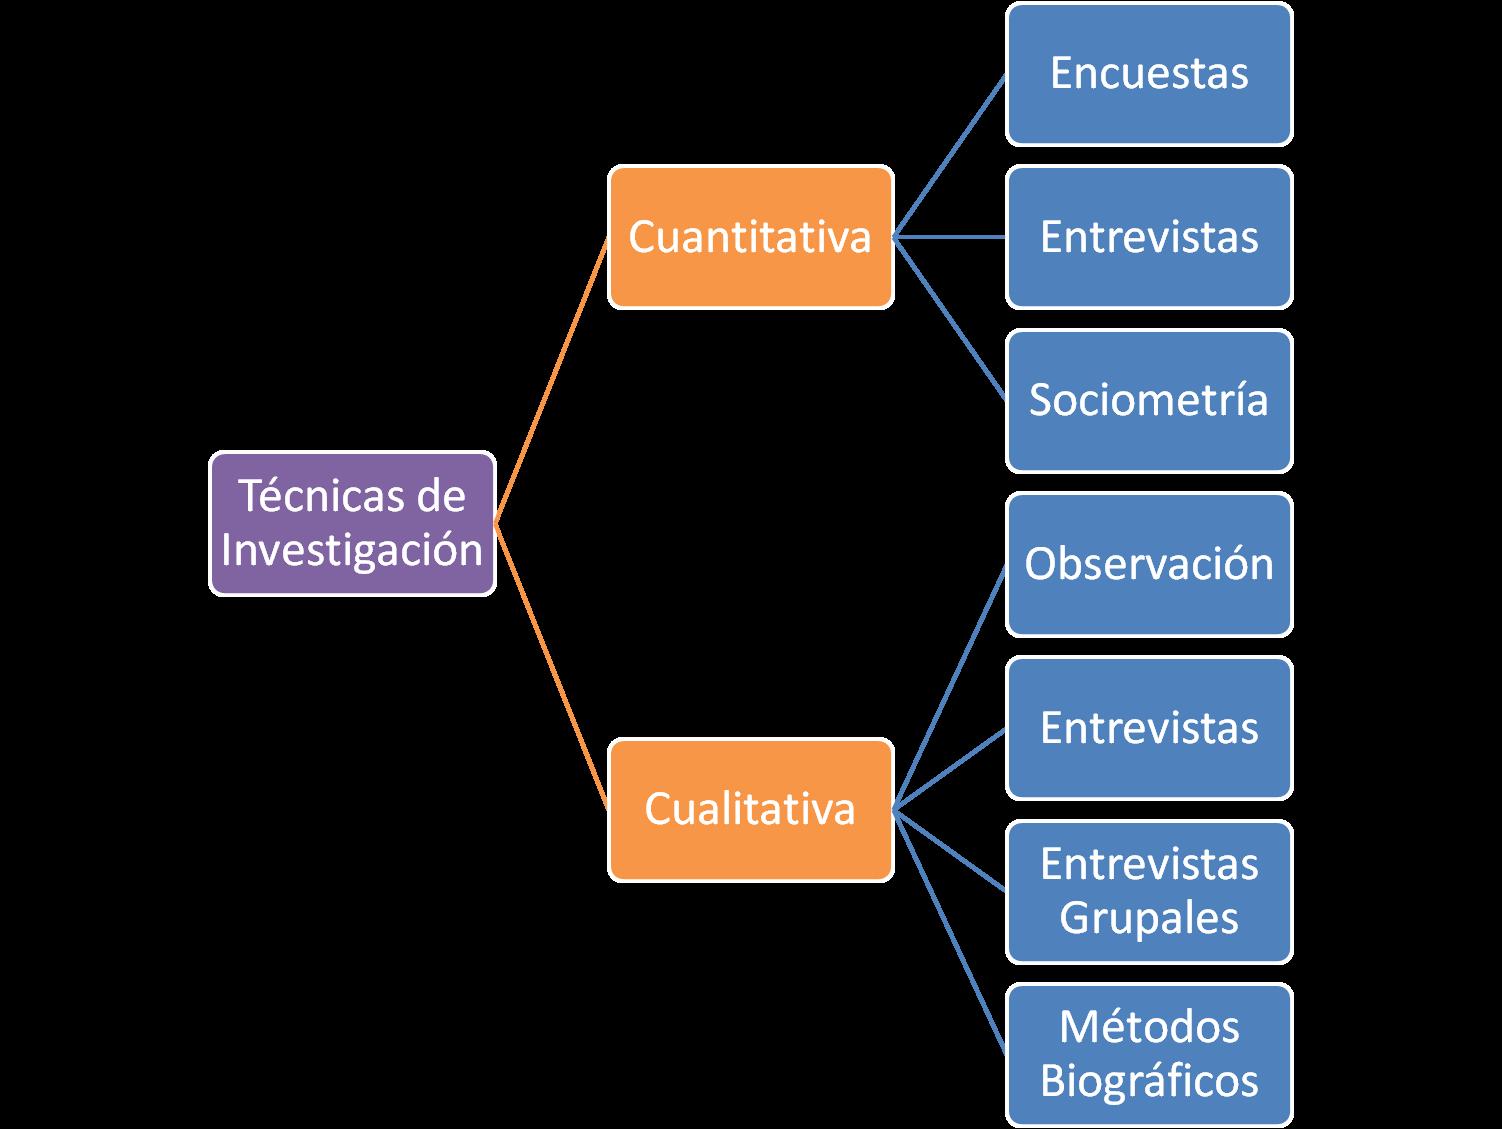 Manual del investigador t cnicas de investigaci n for Tecnicas gastronomicas pdf